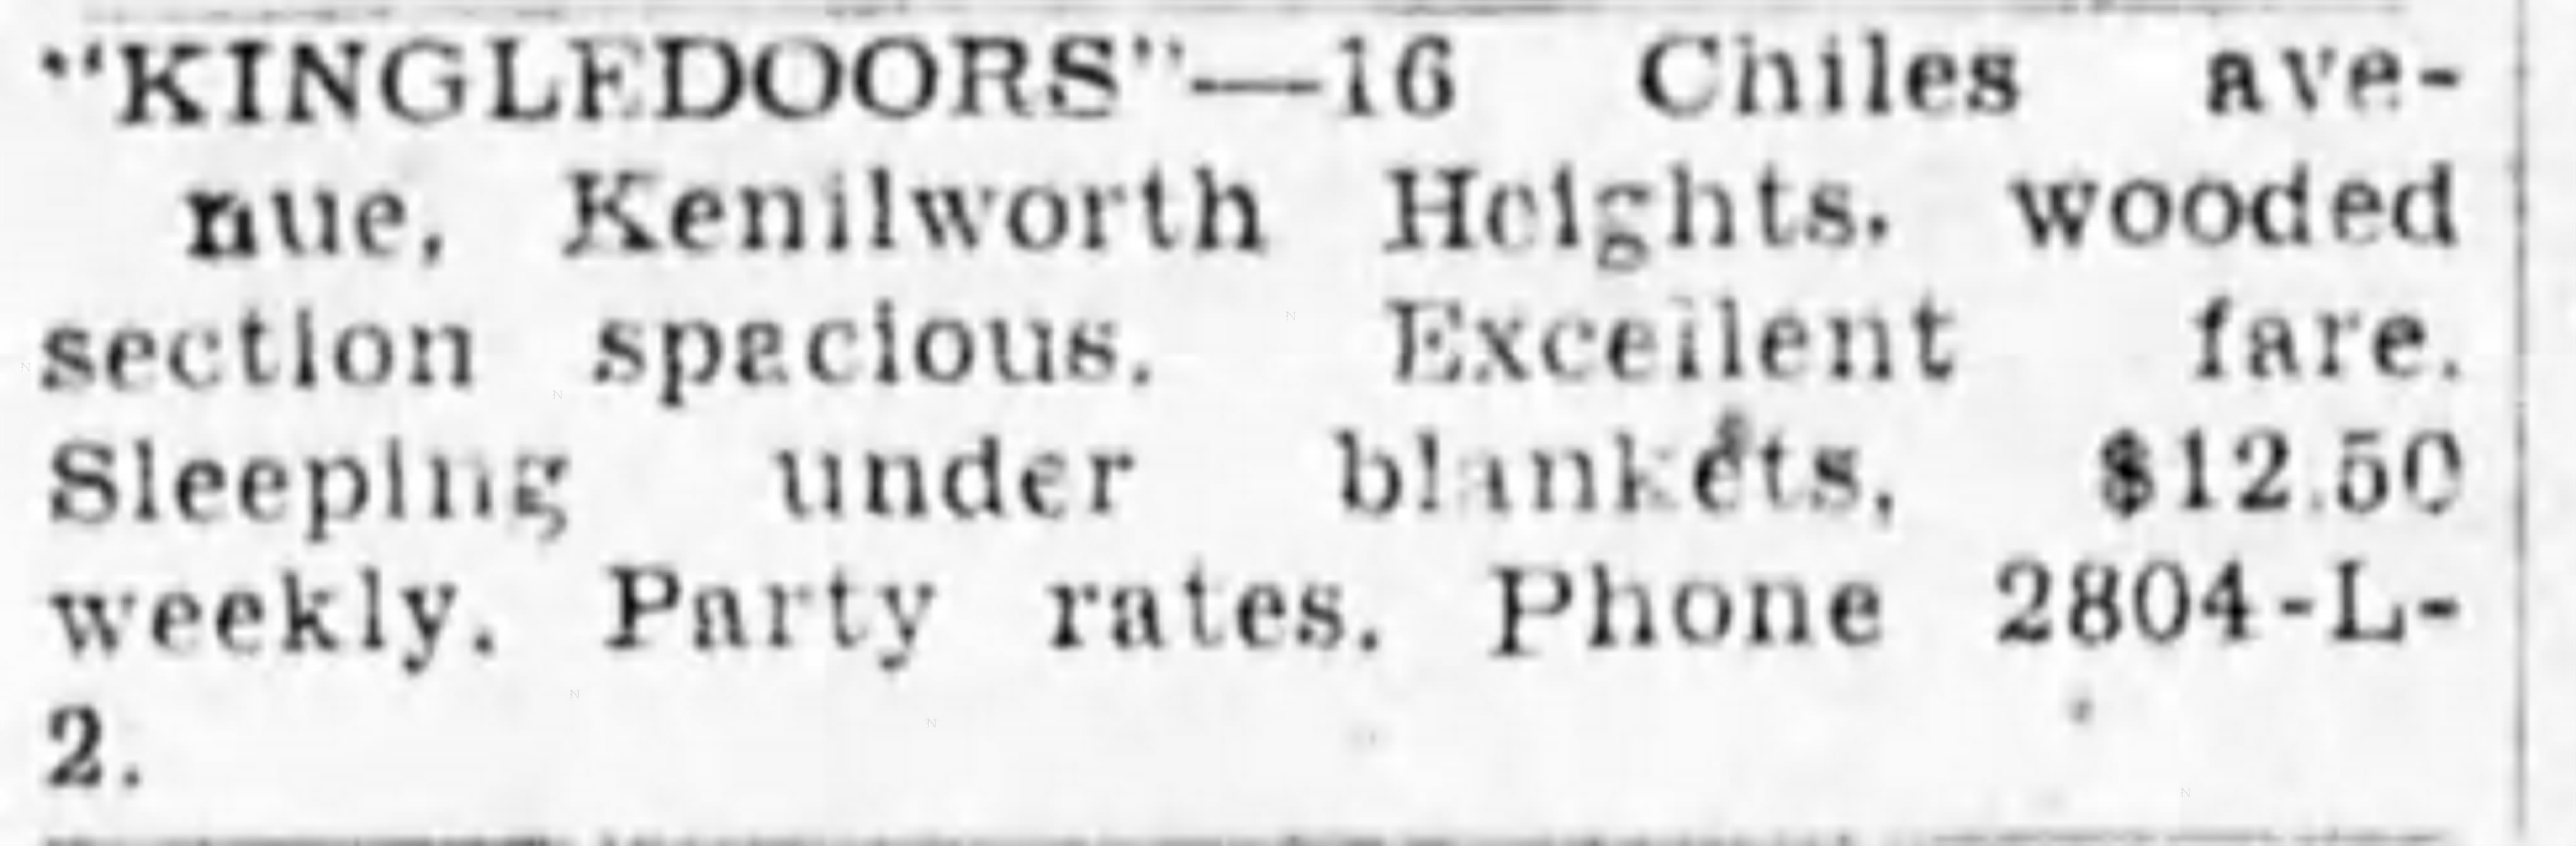 16-chiles-kingledoors-asheville_citizen_times_sun__jul_22__1928_